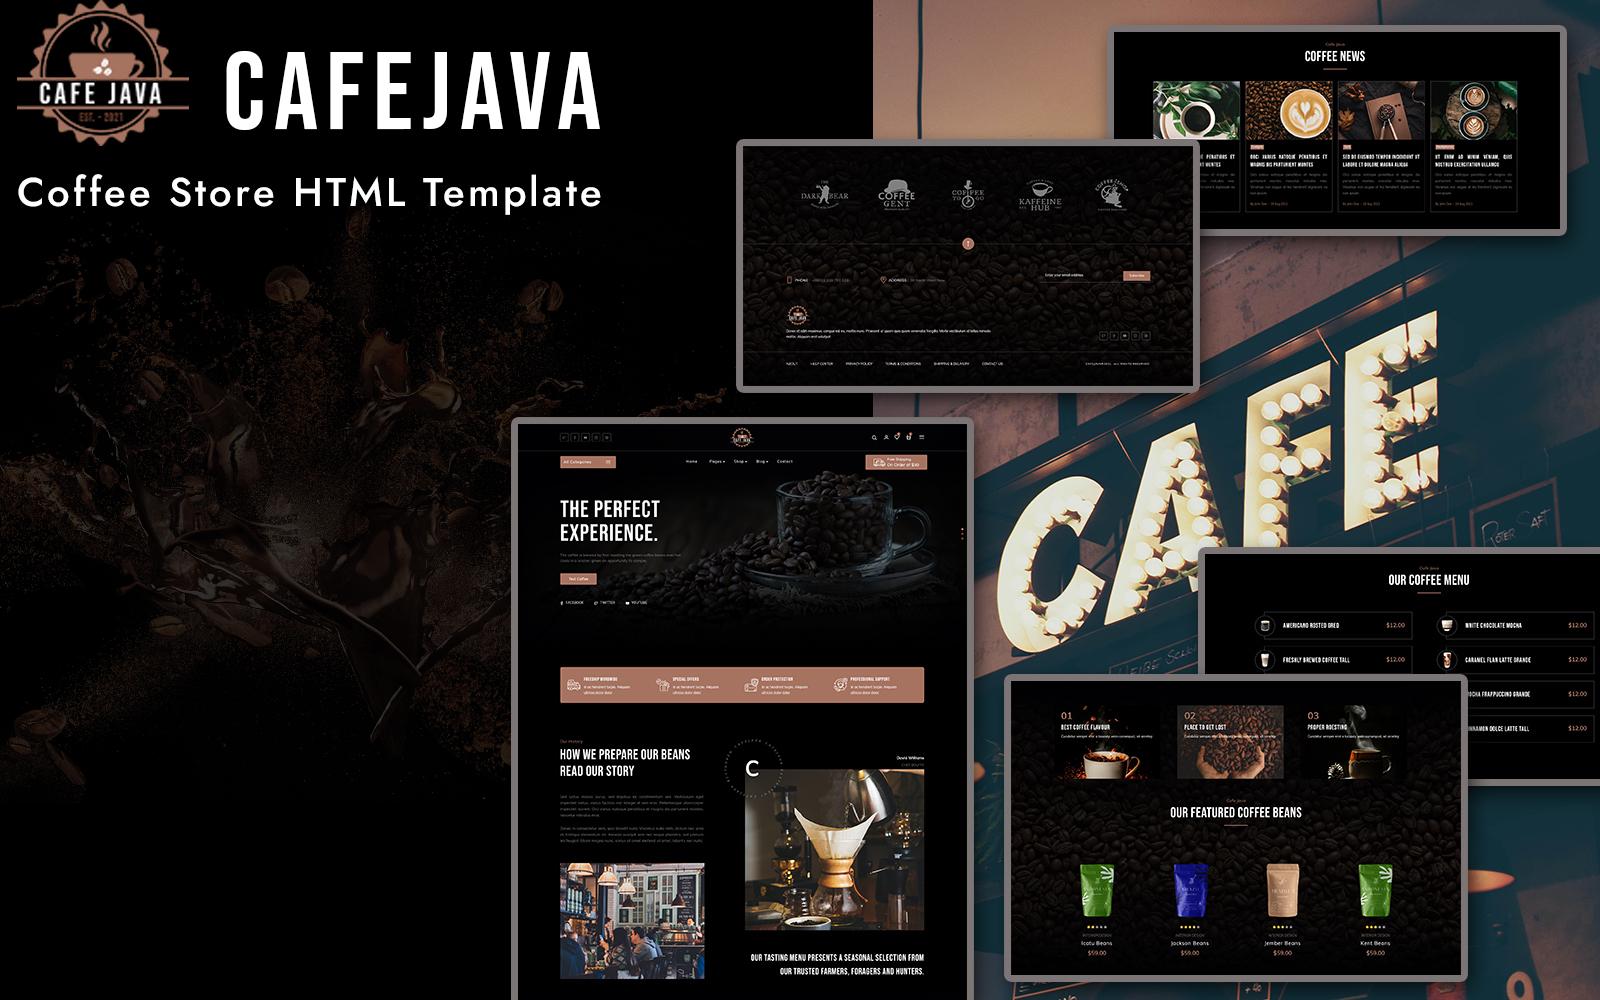 CafeJava - Coffee Store HTML Template